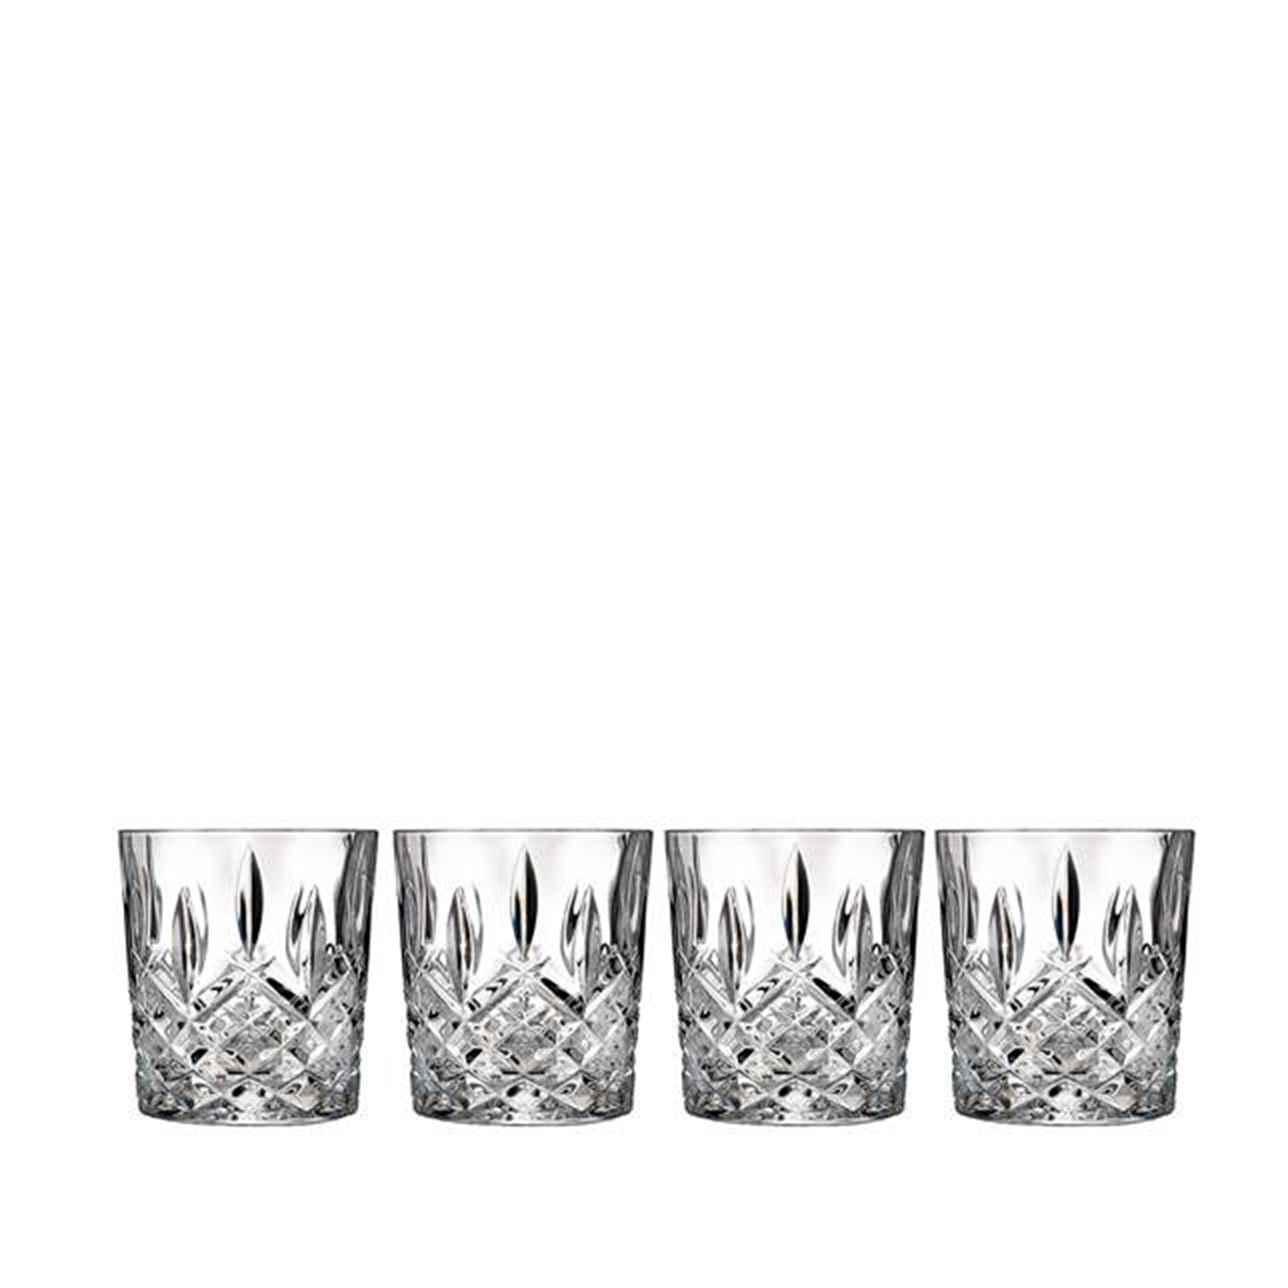 Marquis Markham Whiskey Glasses, Set of 4